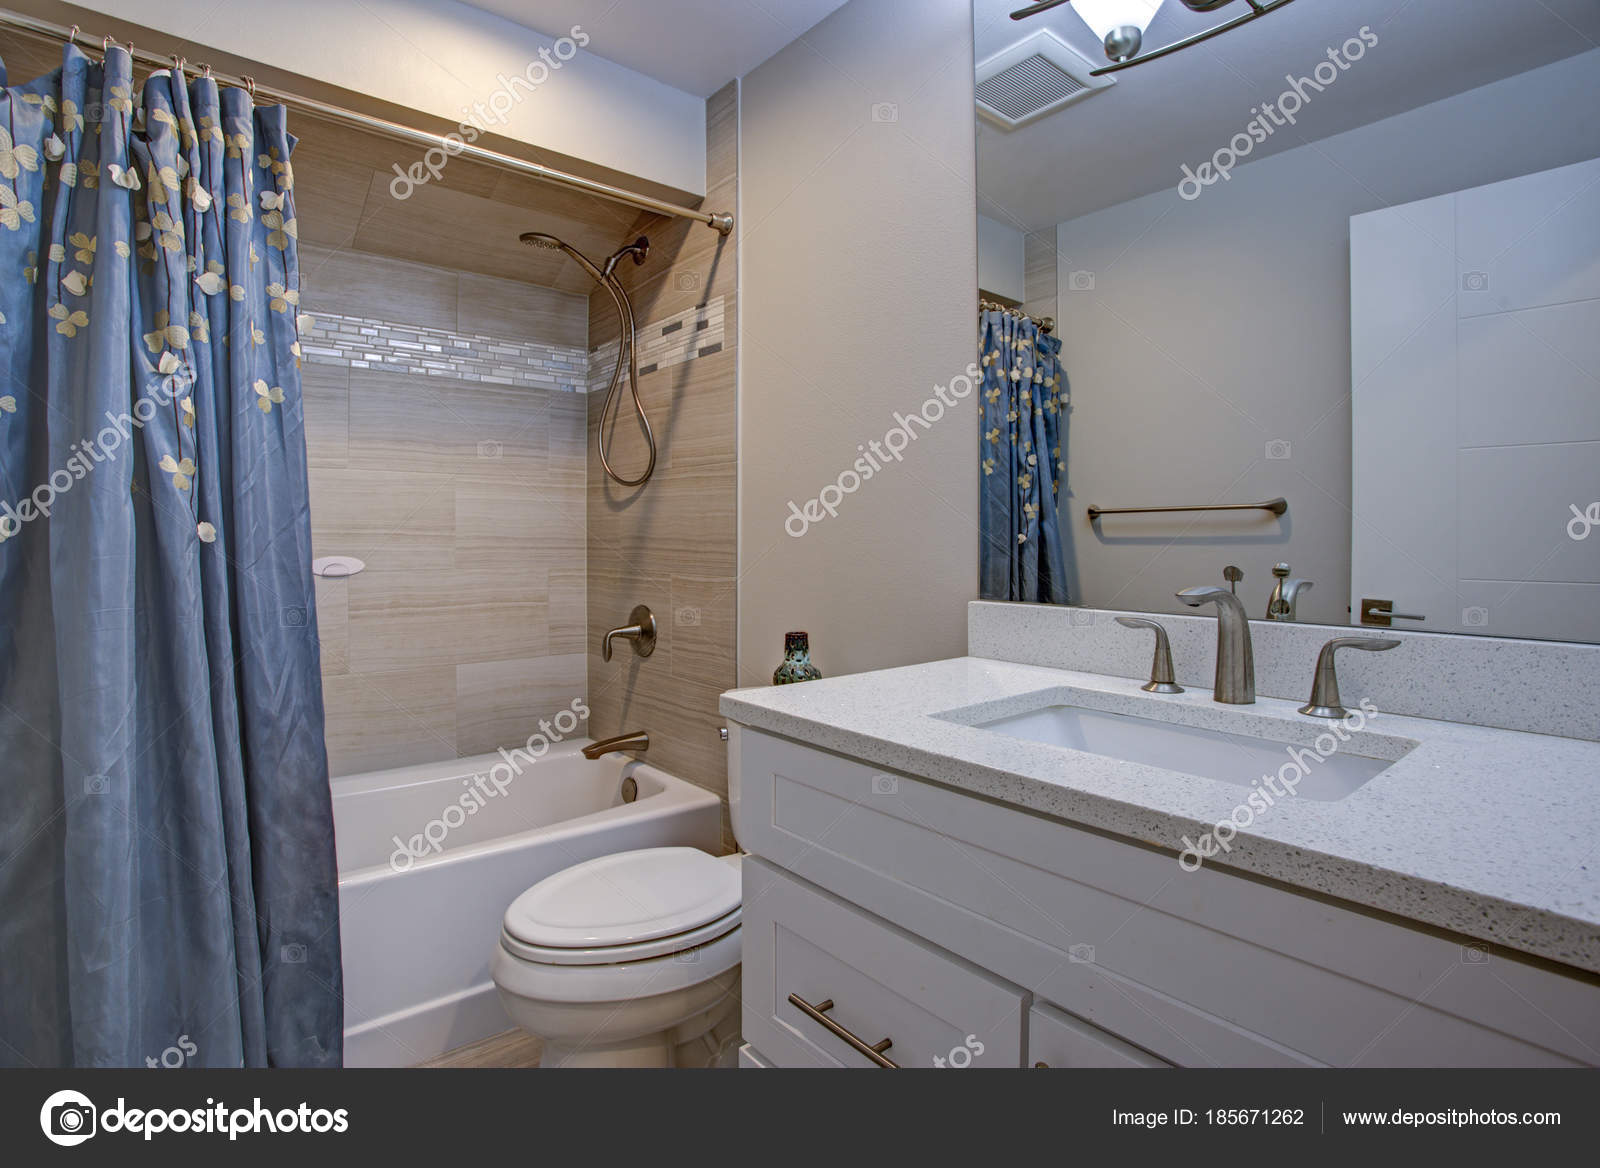 Marmeren Badkamer Vloer : Elegante badkamer met marmeren badkamervloer u stockfoto alabn